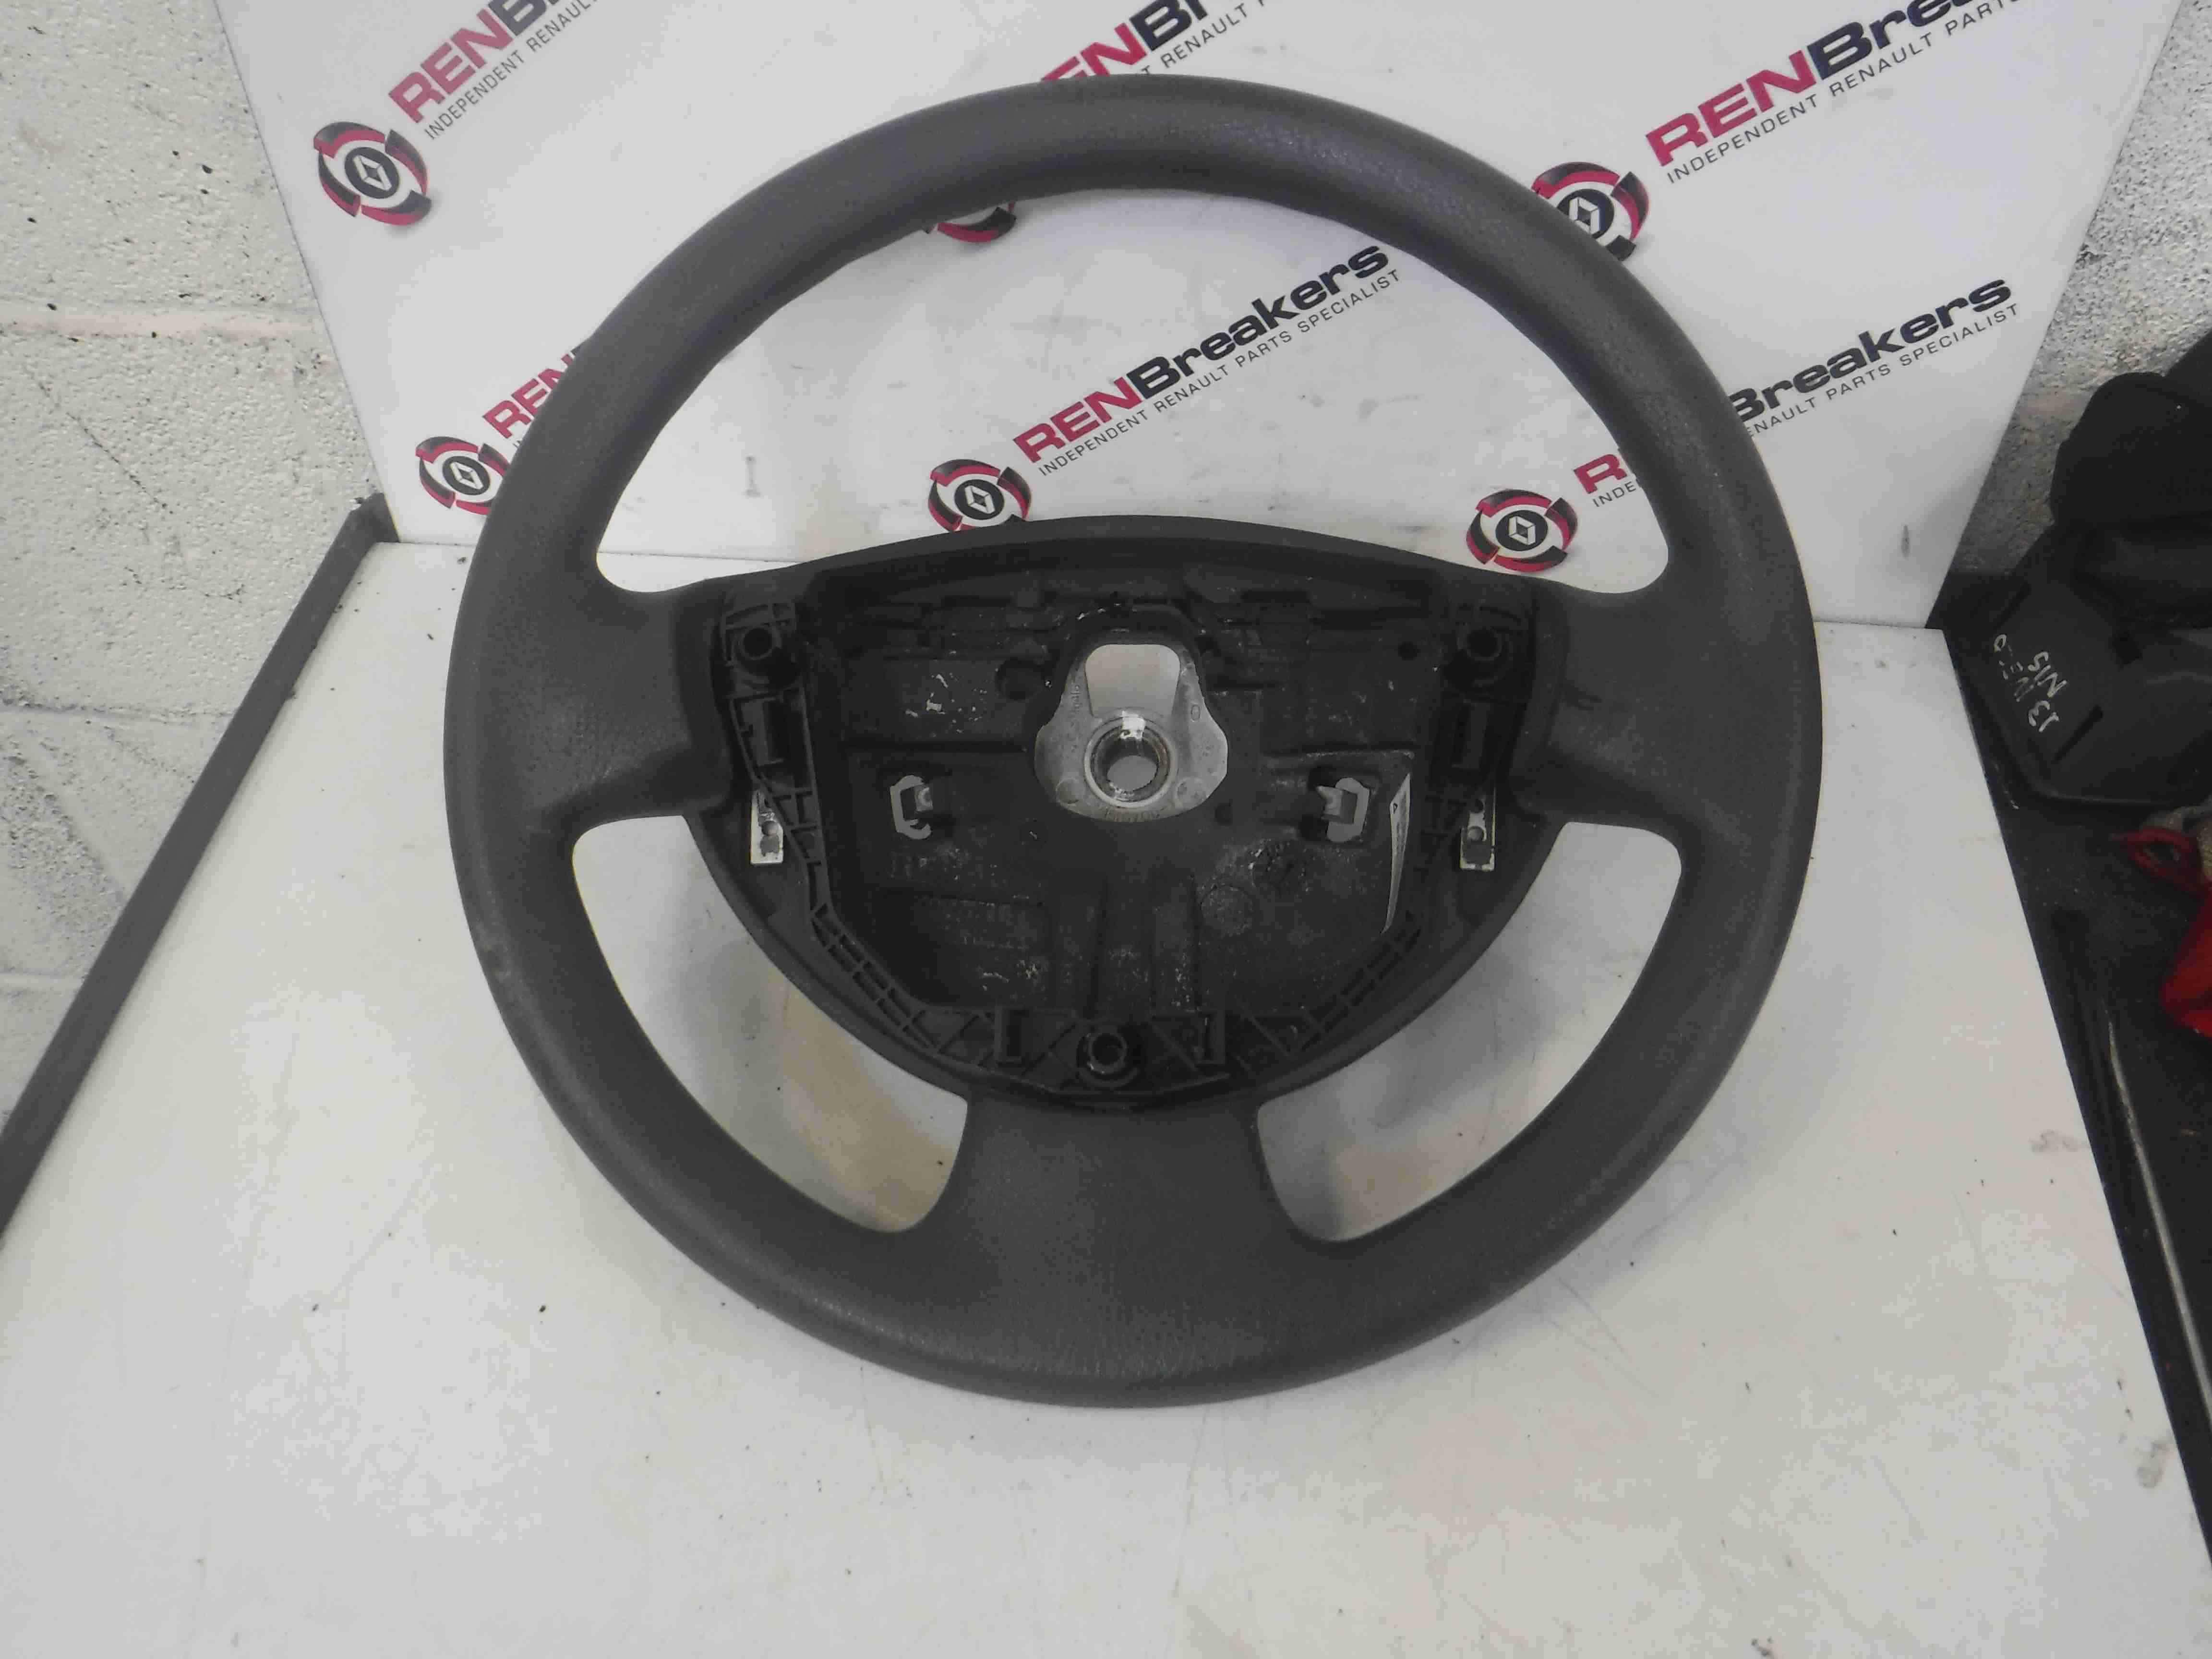 Renault Twingo 2007-2011 Steering Wheel 8200463332